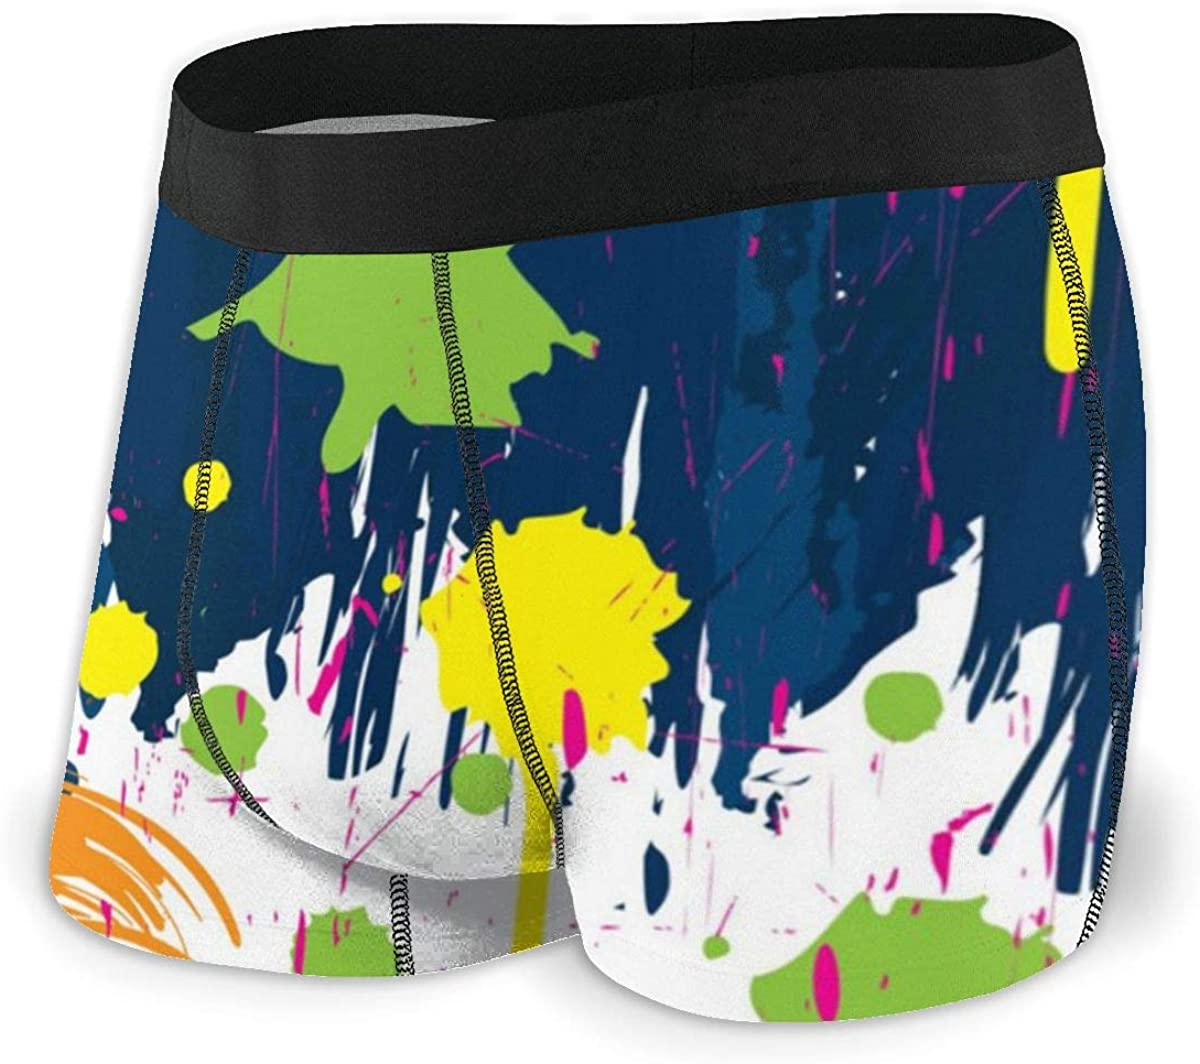 Men's Boxer Briefs Dark Blue Liquid Underwear Trunks Comfortable Training Classic Sweat Proof Bikini Panties